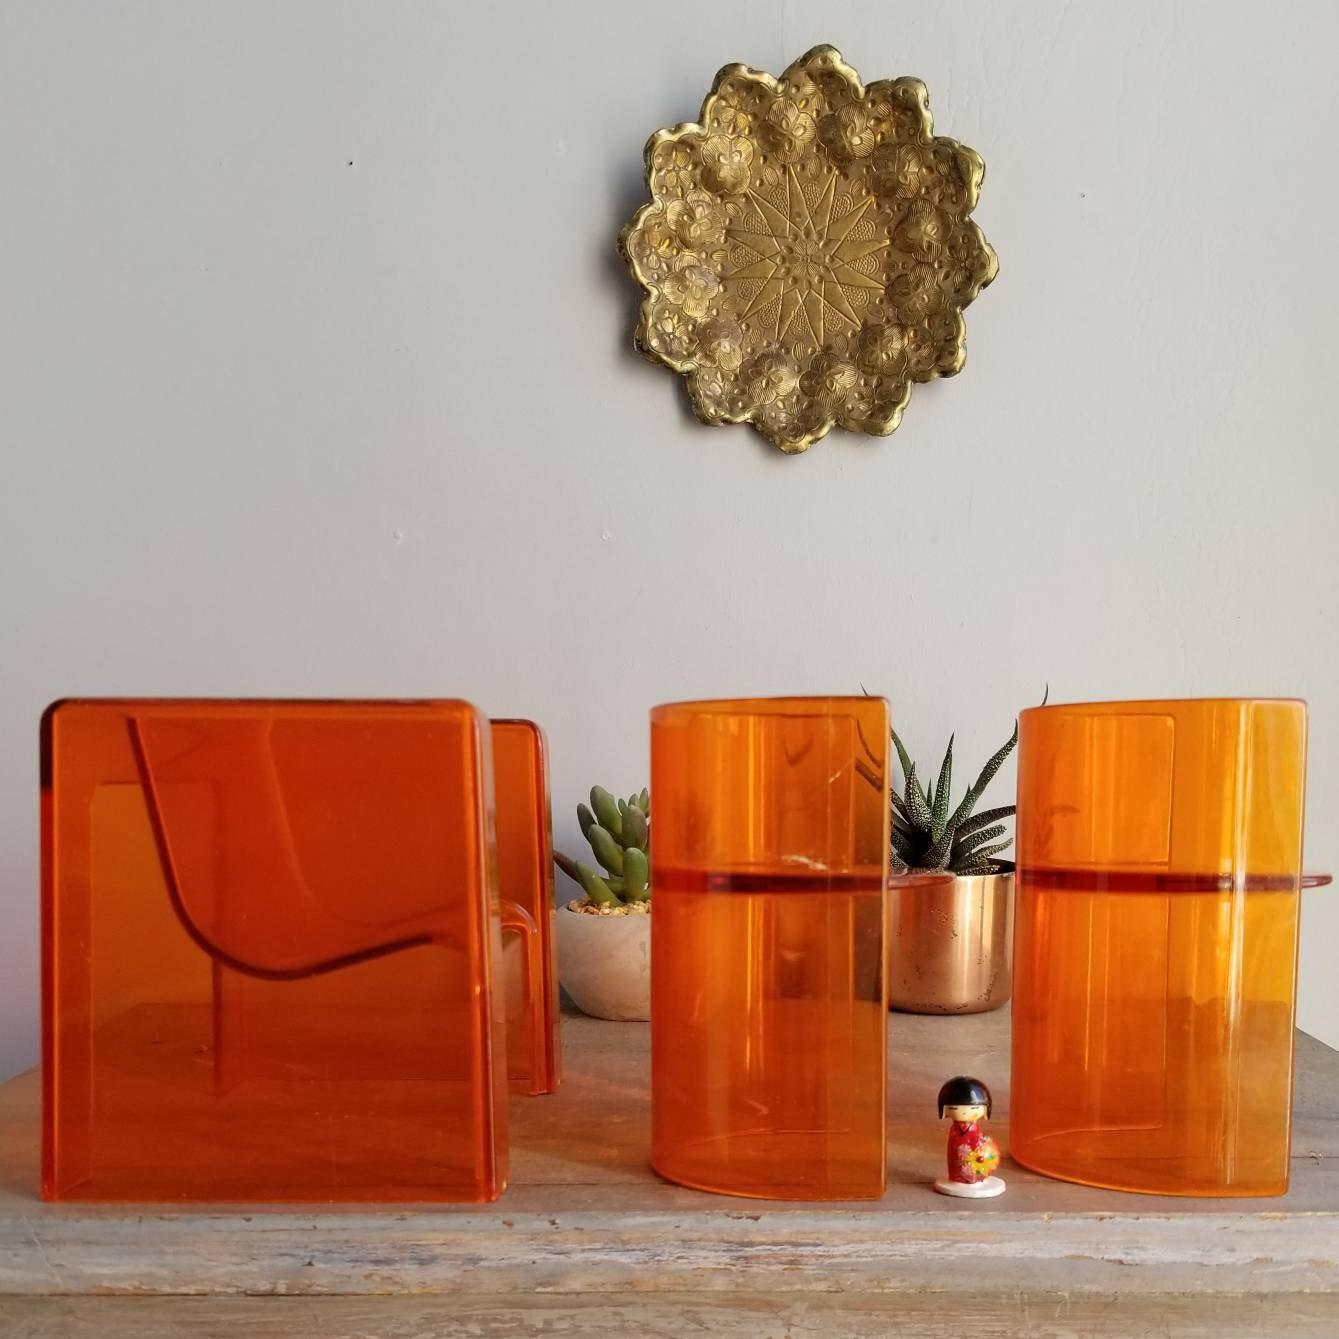 Orange Barbie Furniture, 1970s, Clear Lucite Plastic Doll